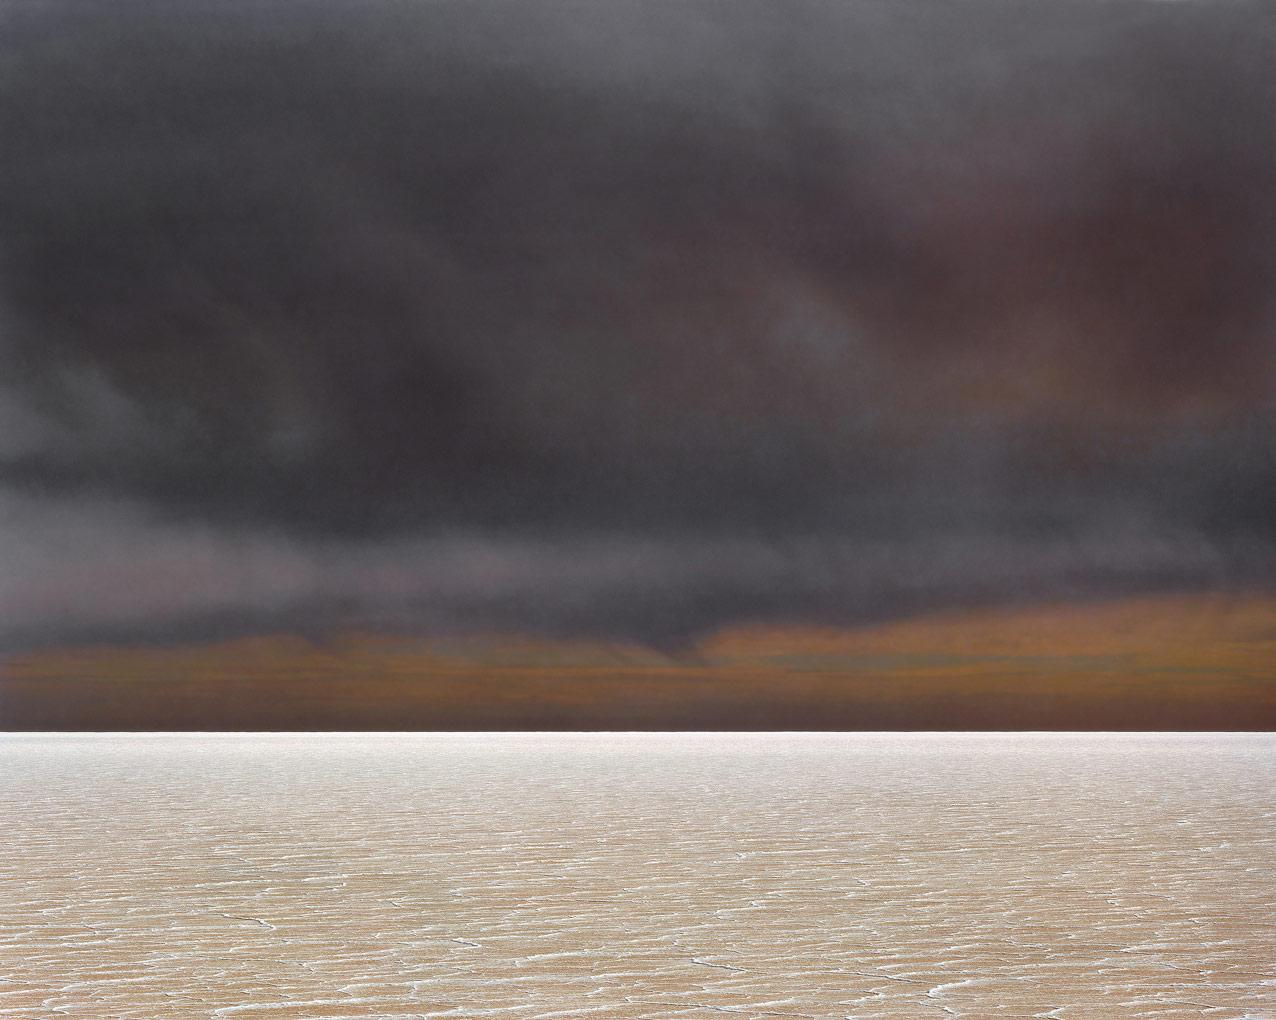 Salt 110, 120cm x 150cm, digital pigment print on cotton rag, edition of 7, 2006